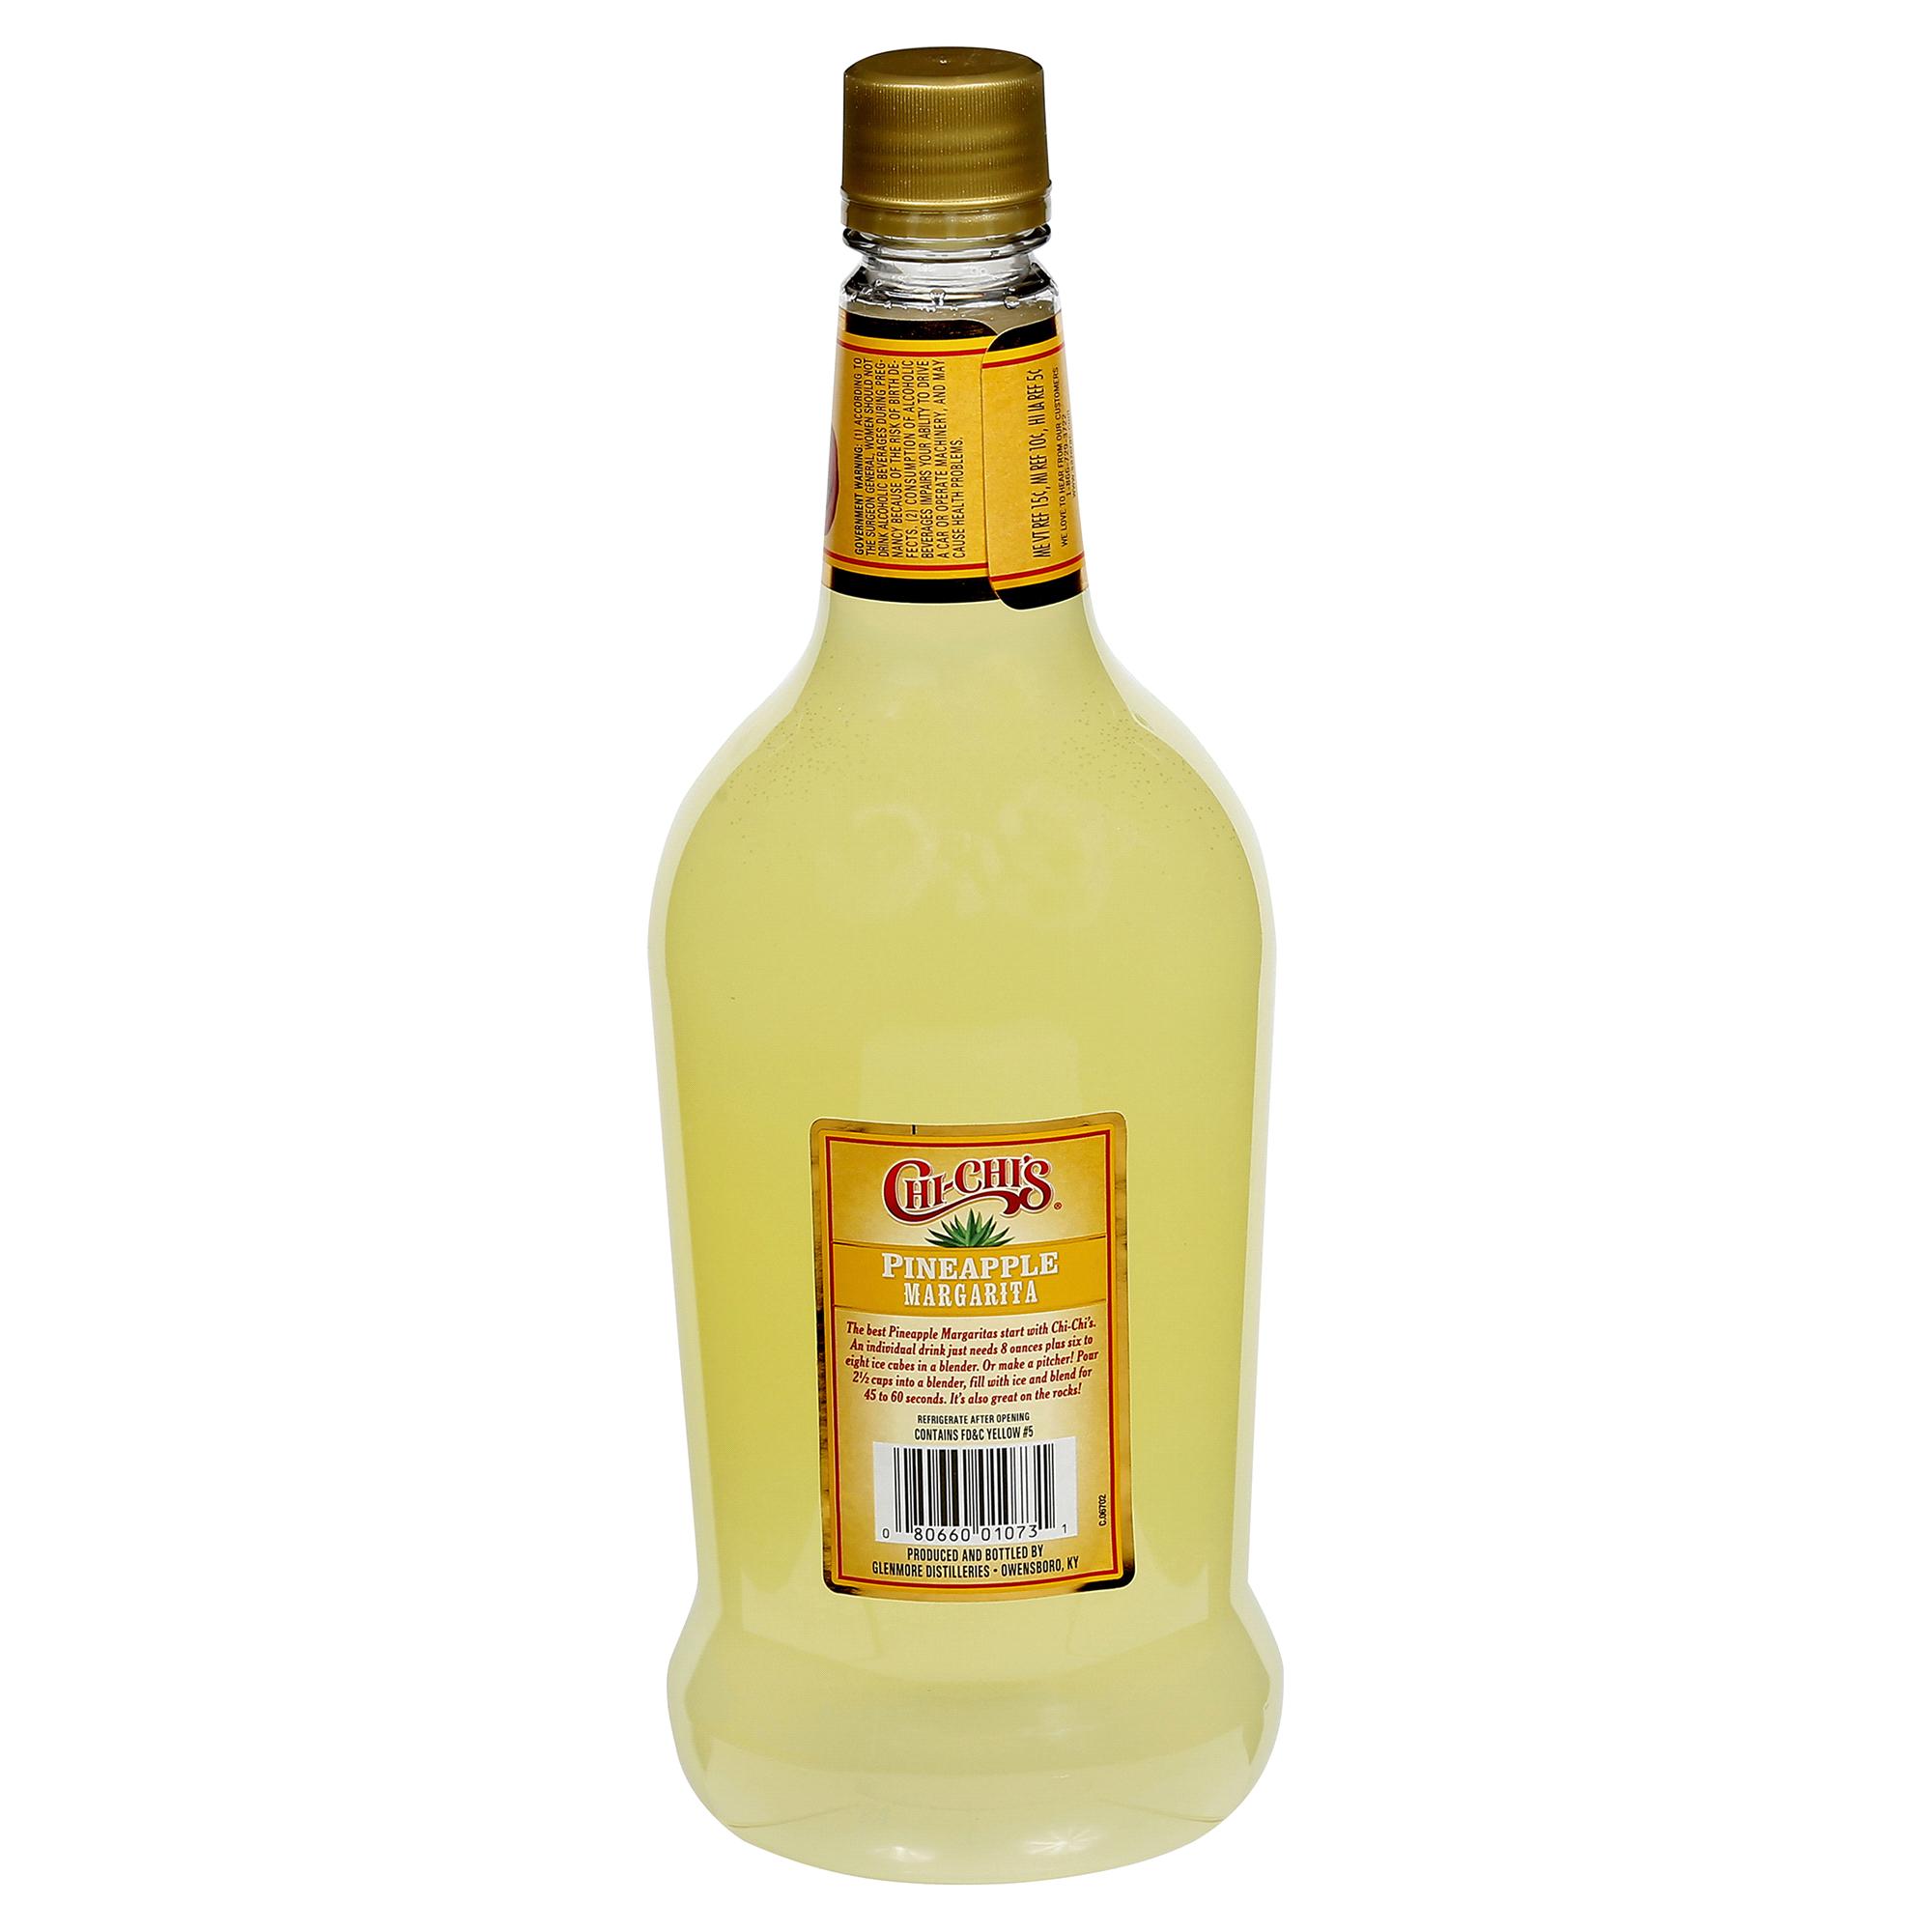 chi chis pineapple margarita 1 75 lt meijer com